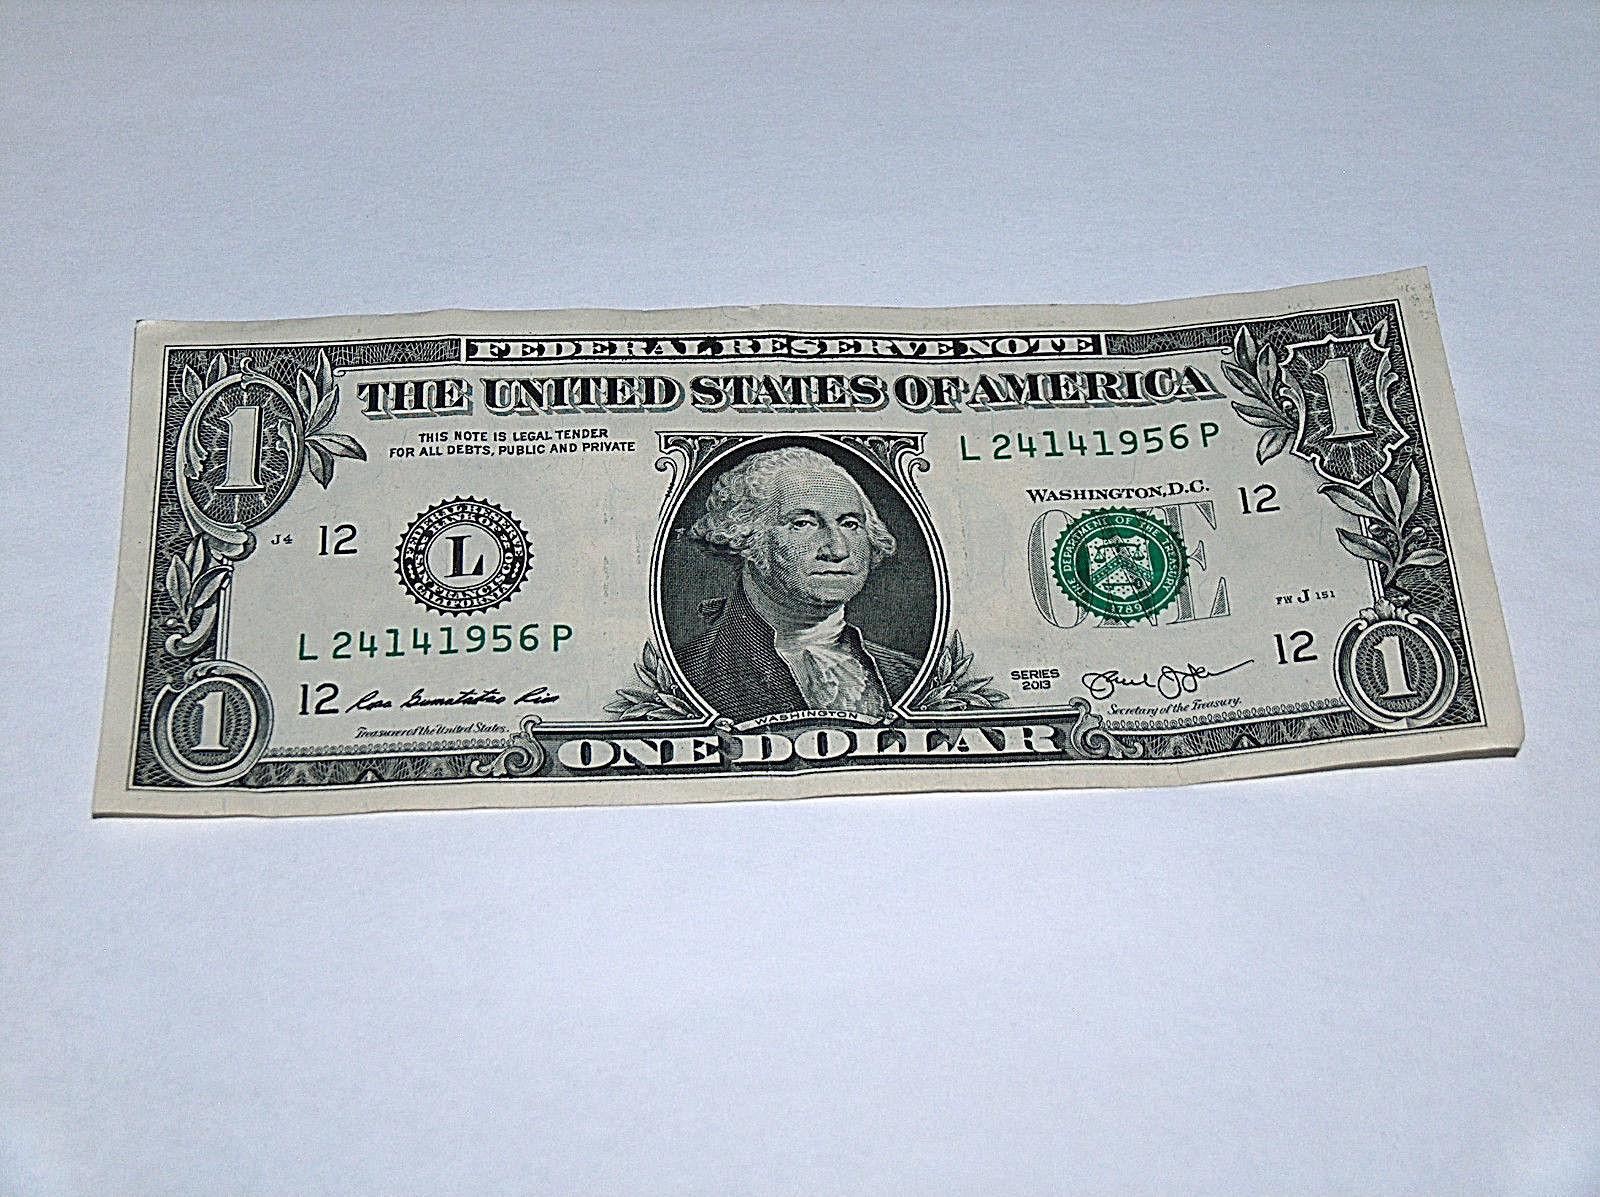 2013 $1 Dollar Bill US Bank Note Year Date Birthday 2414 1956 Fancy Money Serial